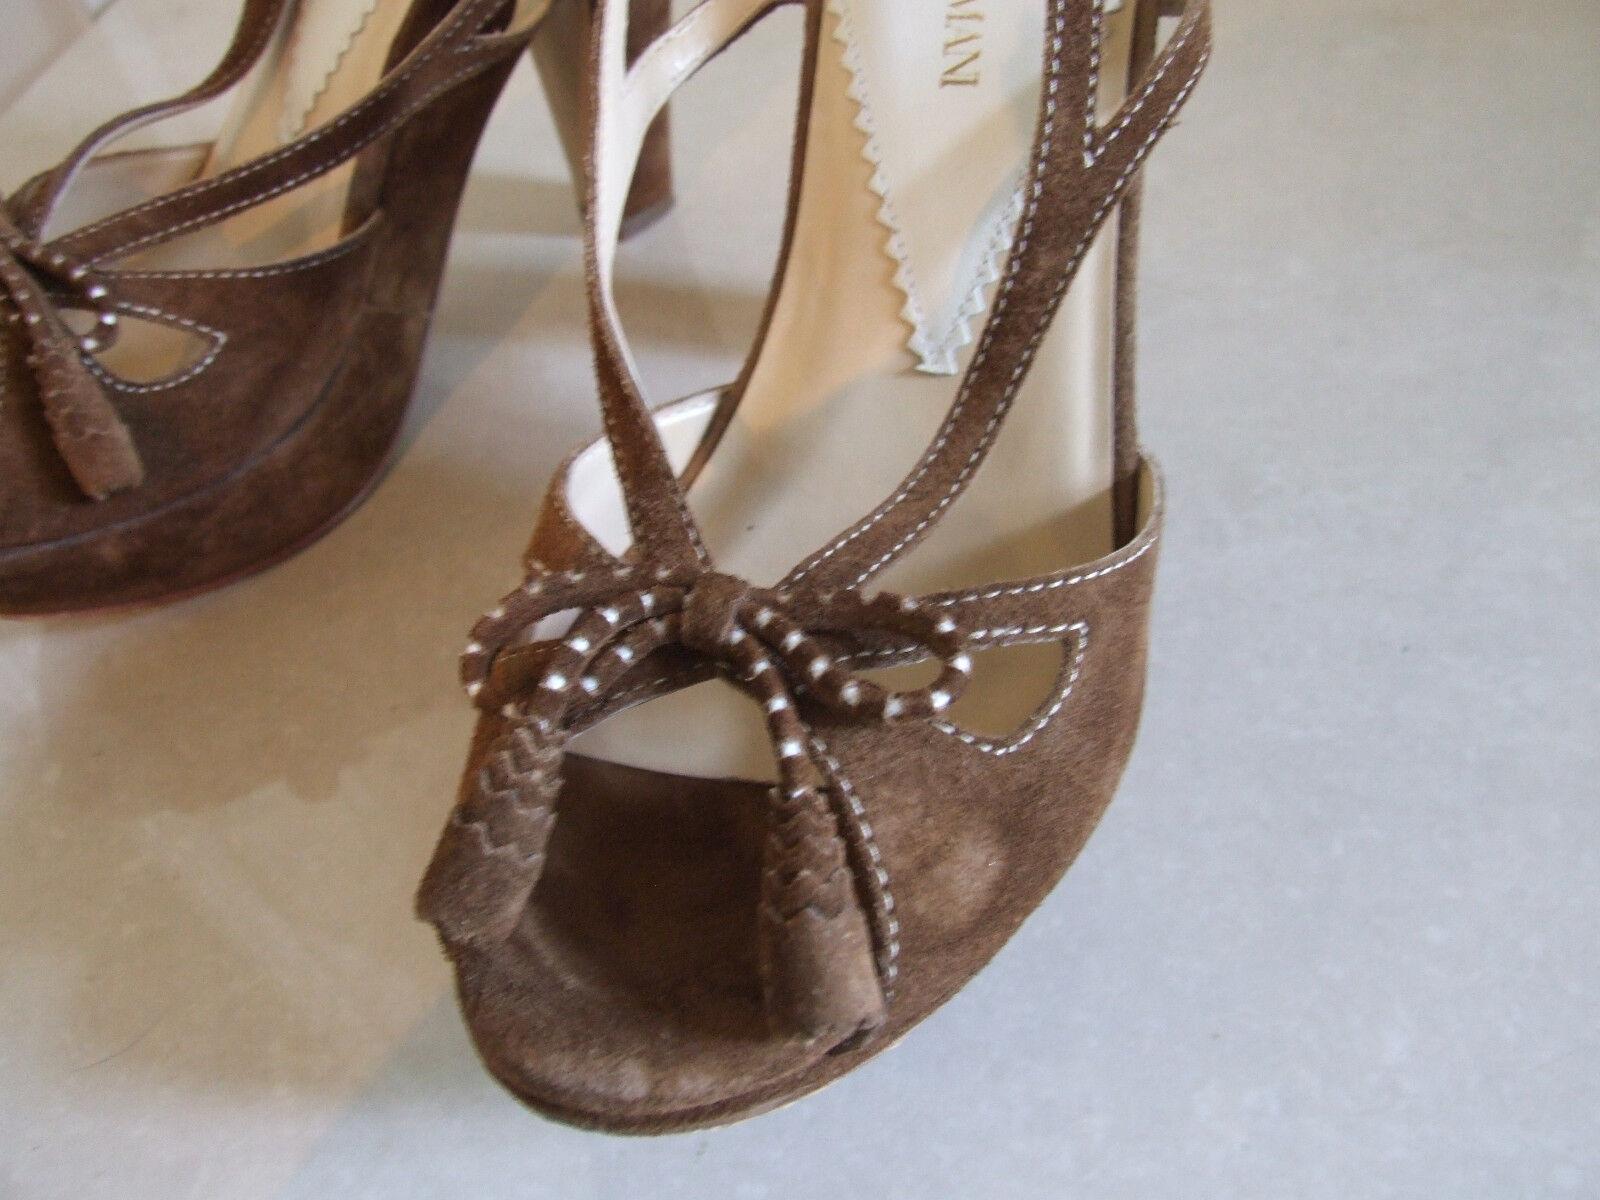 Giorgio Armani Classic Braun Suede High Heels 5 Slingback Stiletto Sandales Schuhes 5 Heels 2a1bd6